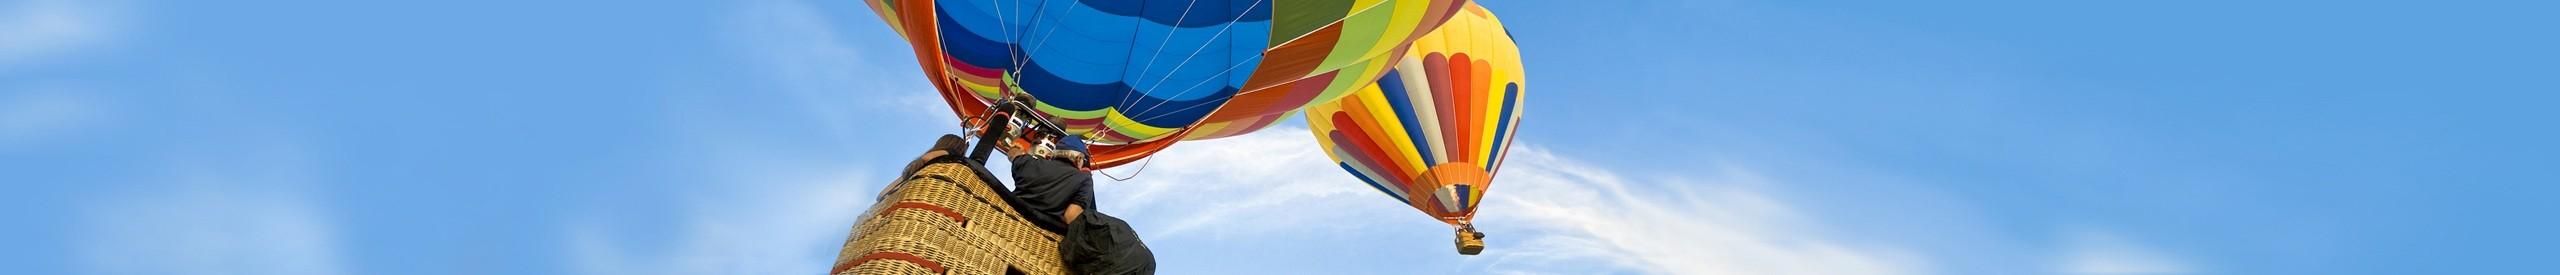 Rundfahrt im Heißluftballon